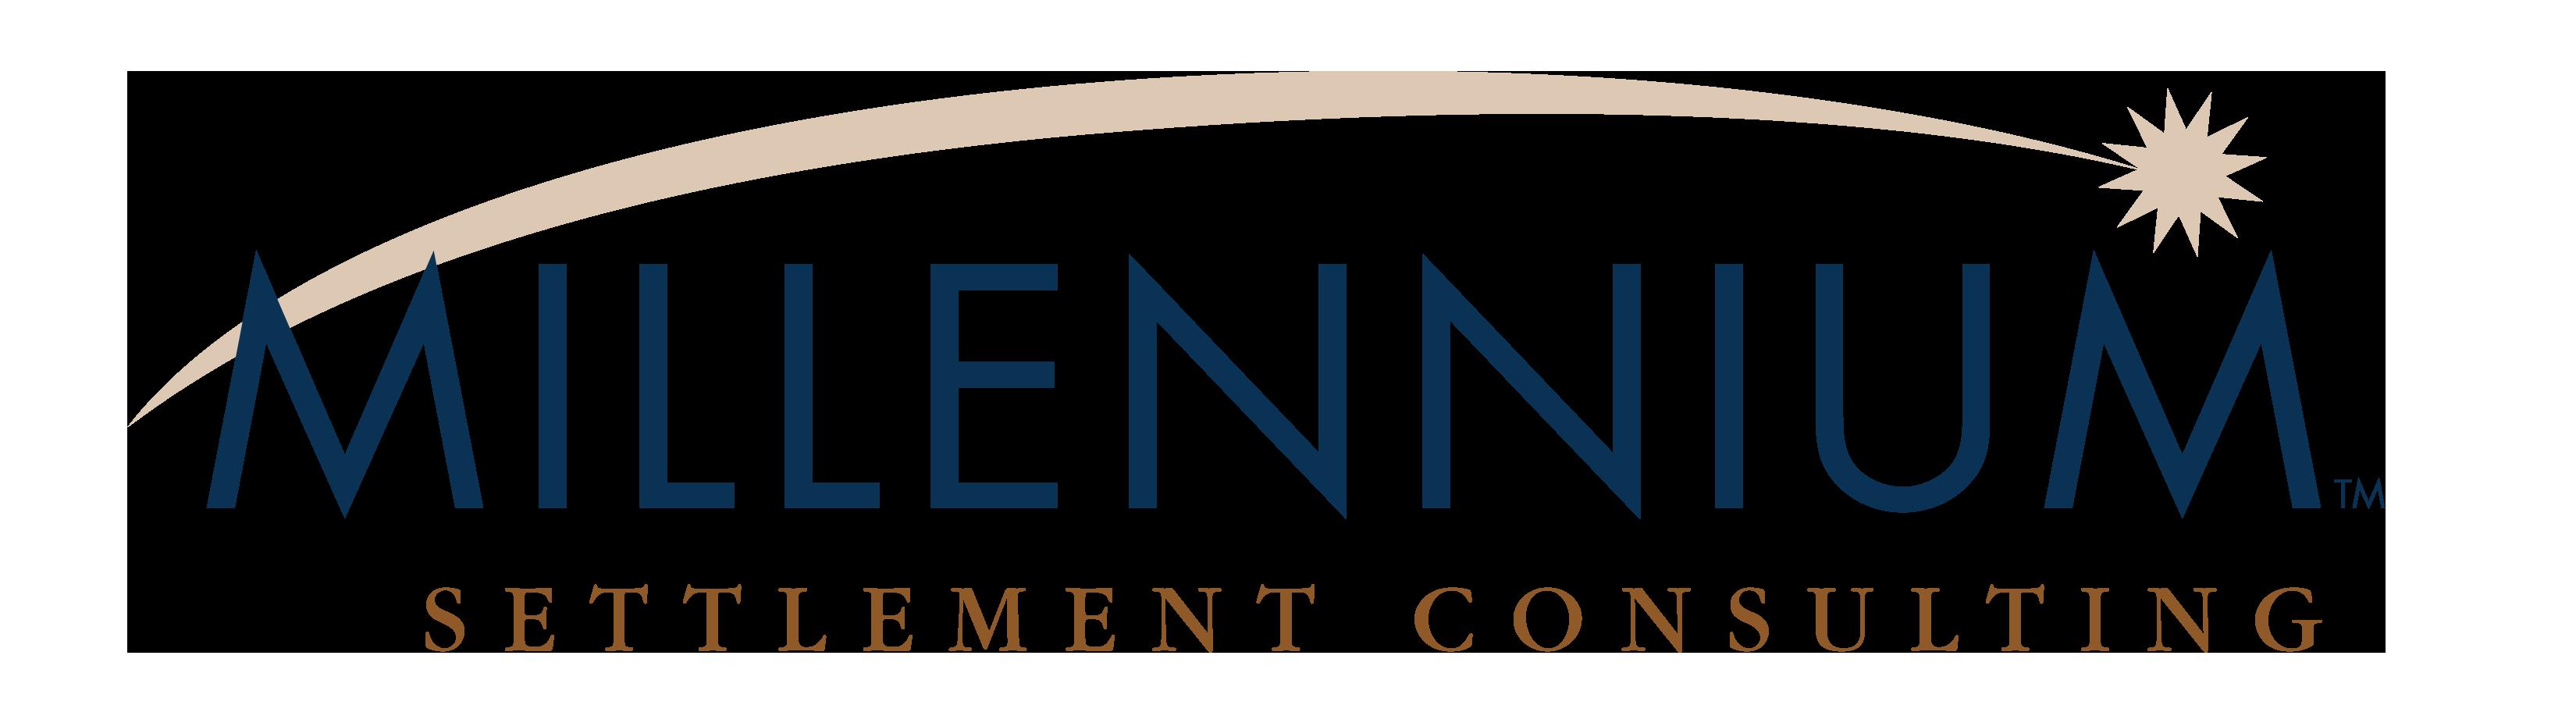 MilleniumSettlement_Logo